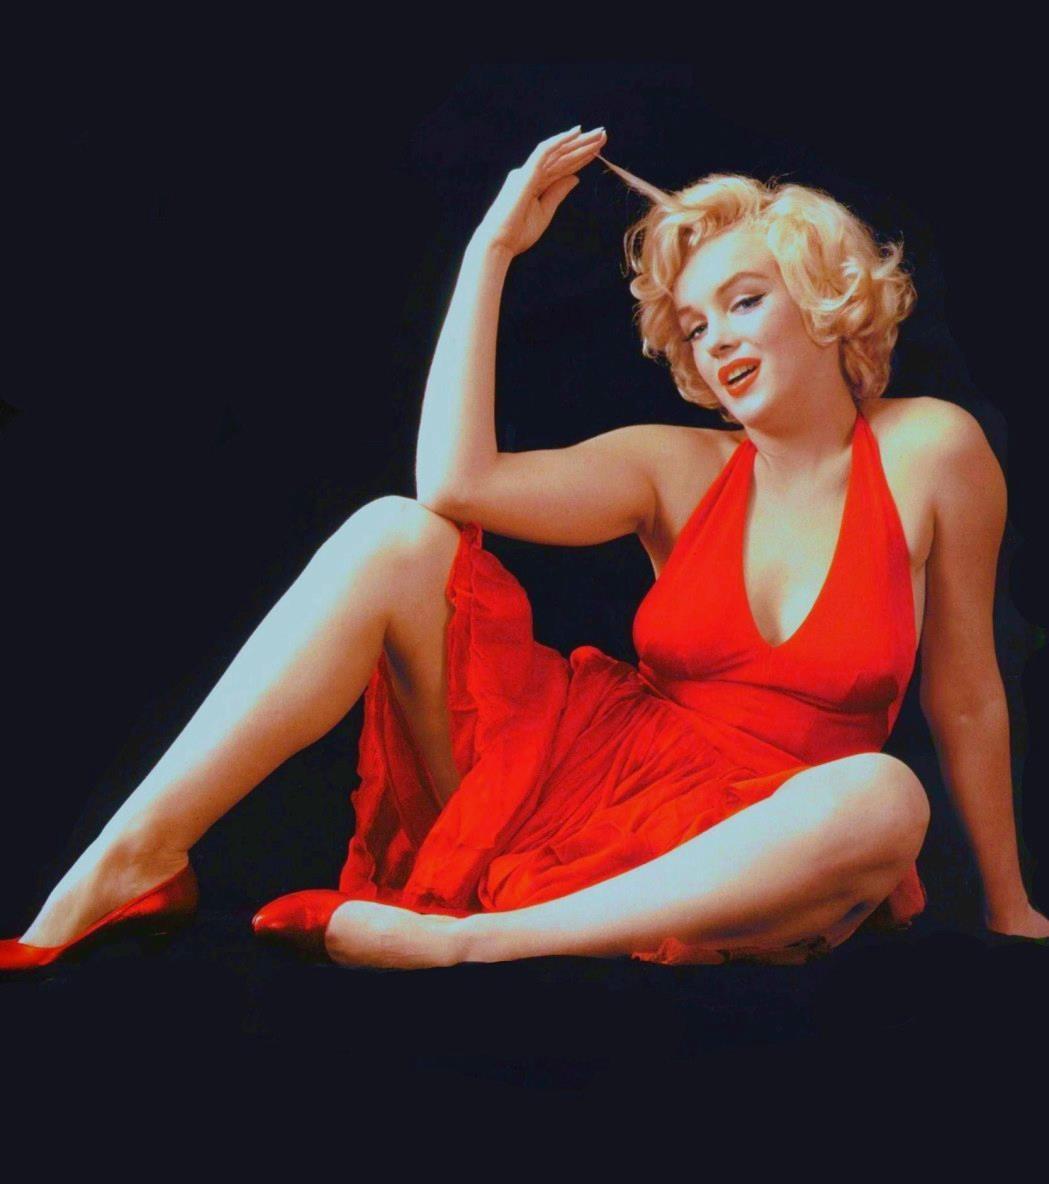 1957 / by Milton GREENE